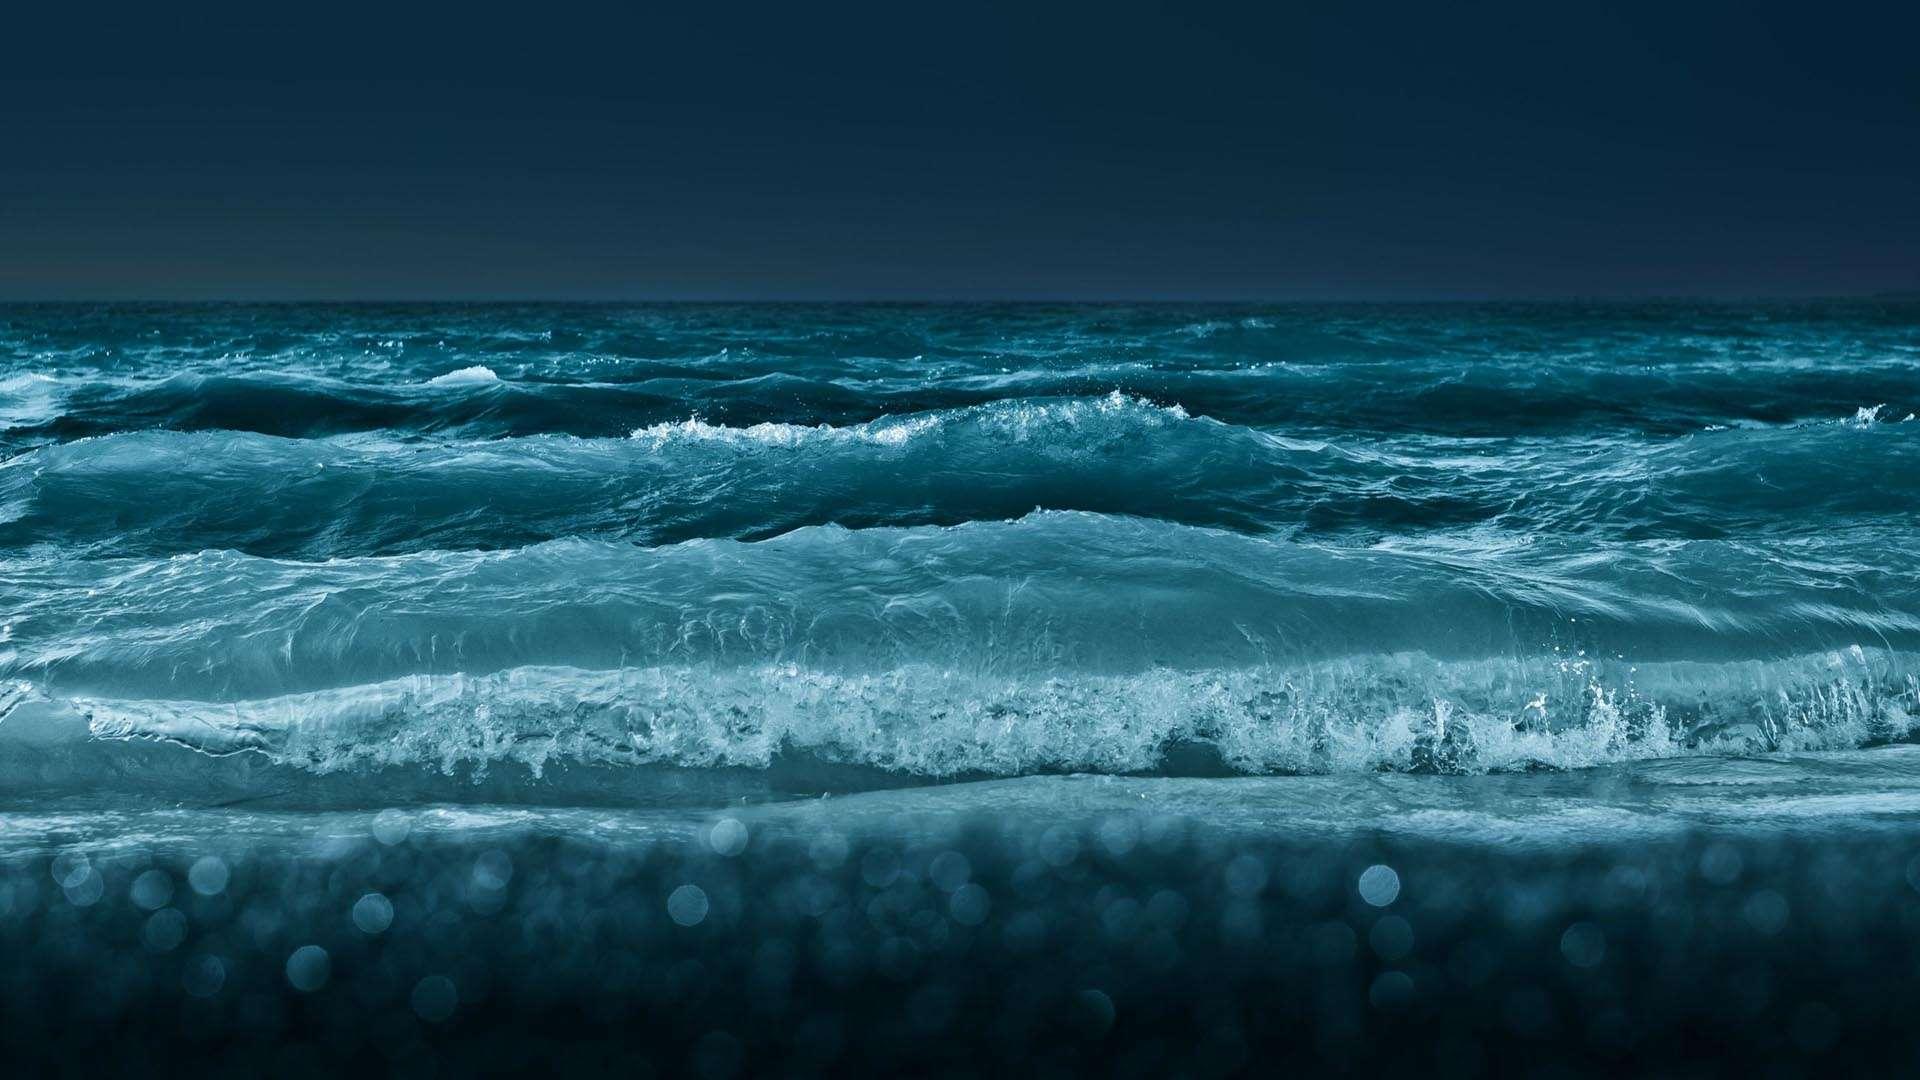 Deep Sea Wallpapers 1920x1080